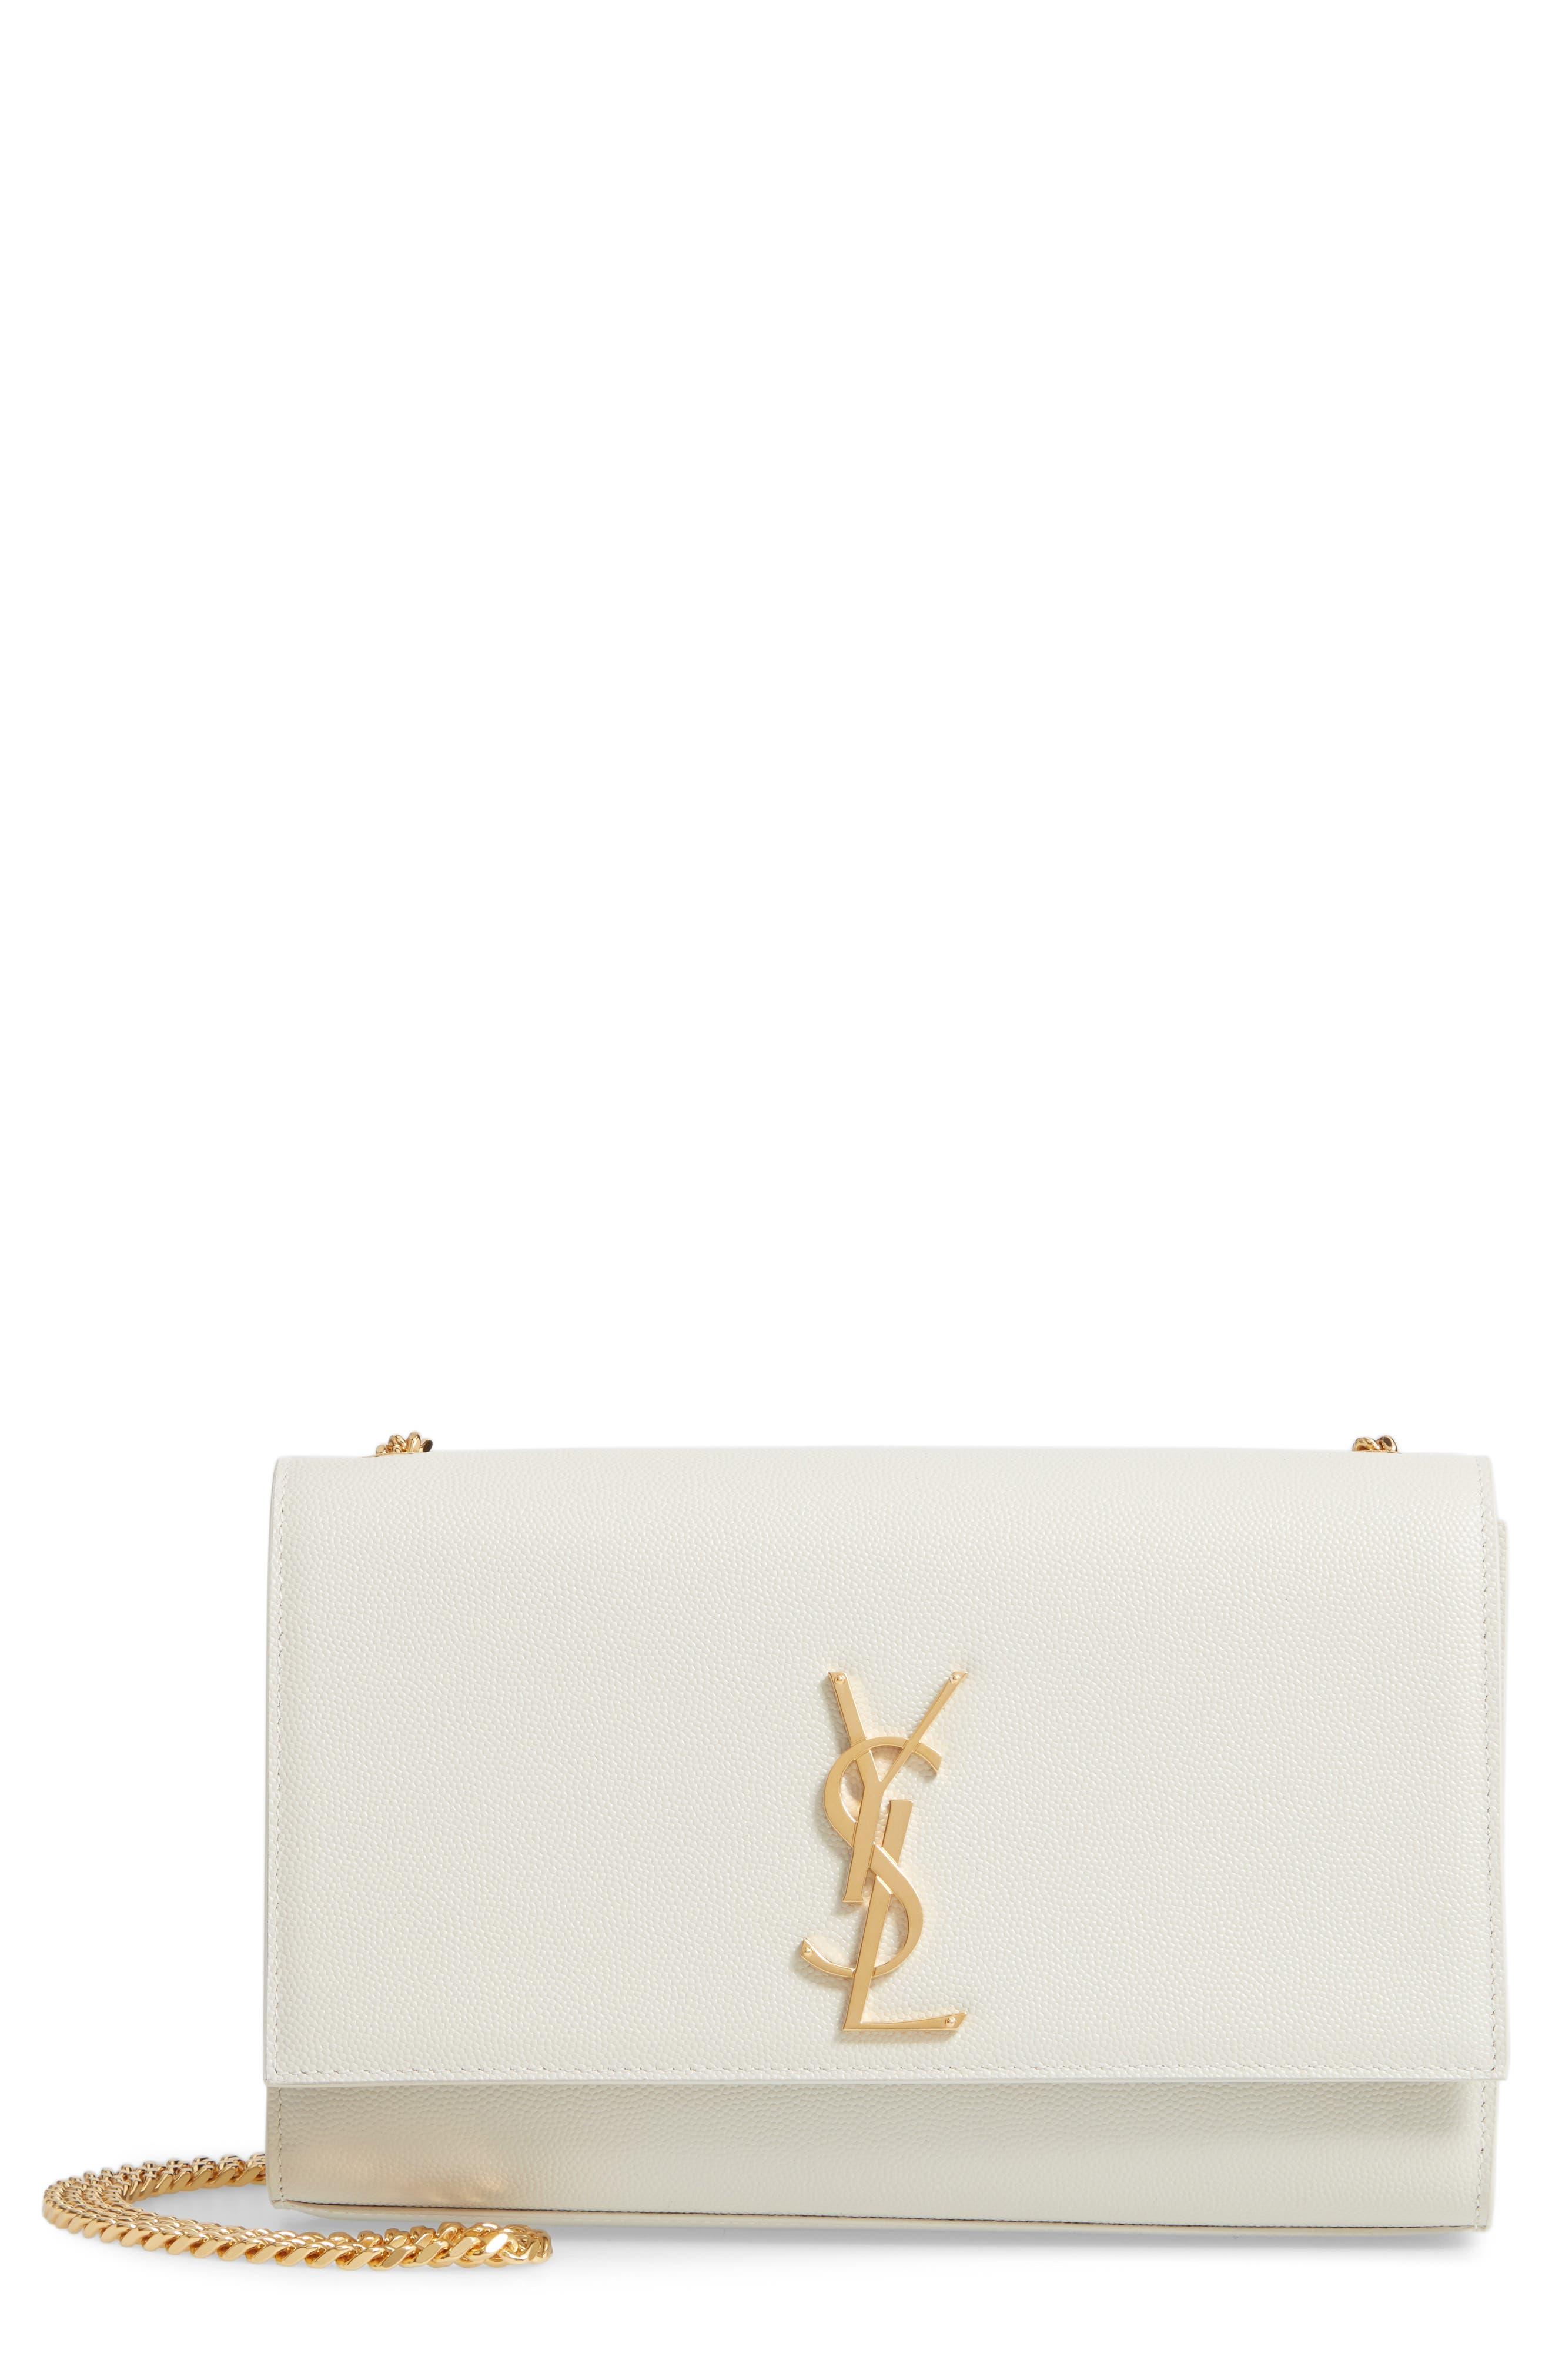 ,                             'Medium Kate' Leather Chain Shoulder Bag,                             Main thumbnail 1, color,                             CREMASOFT